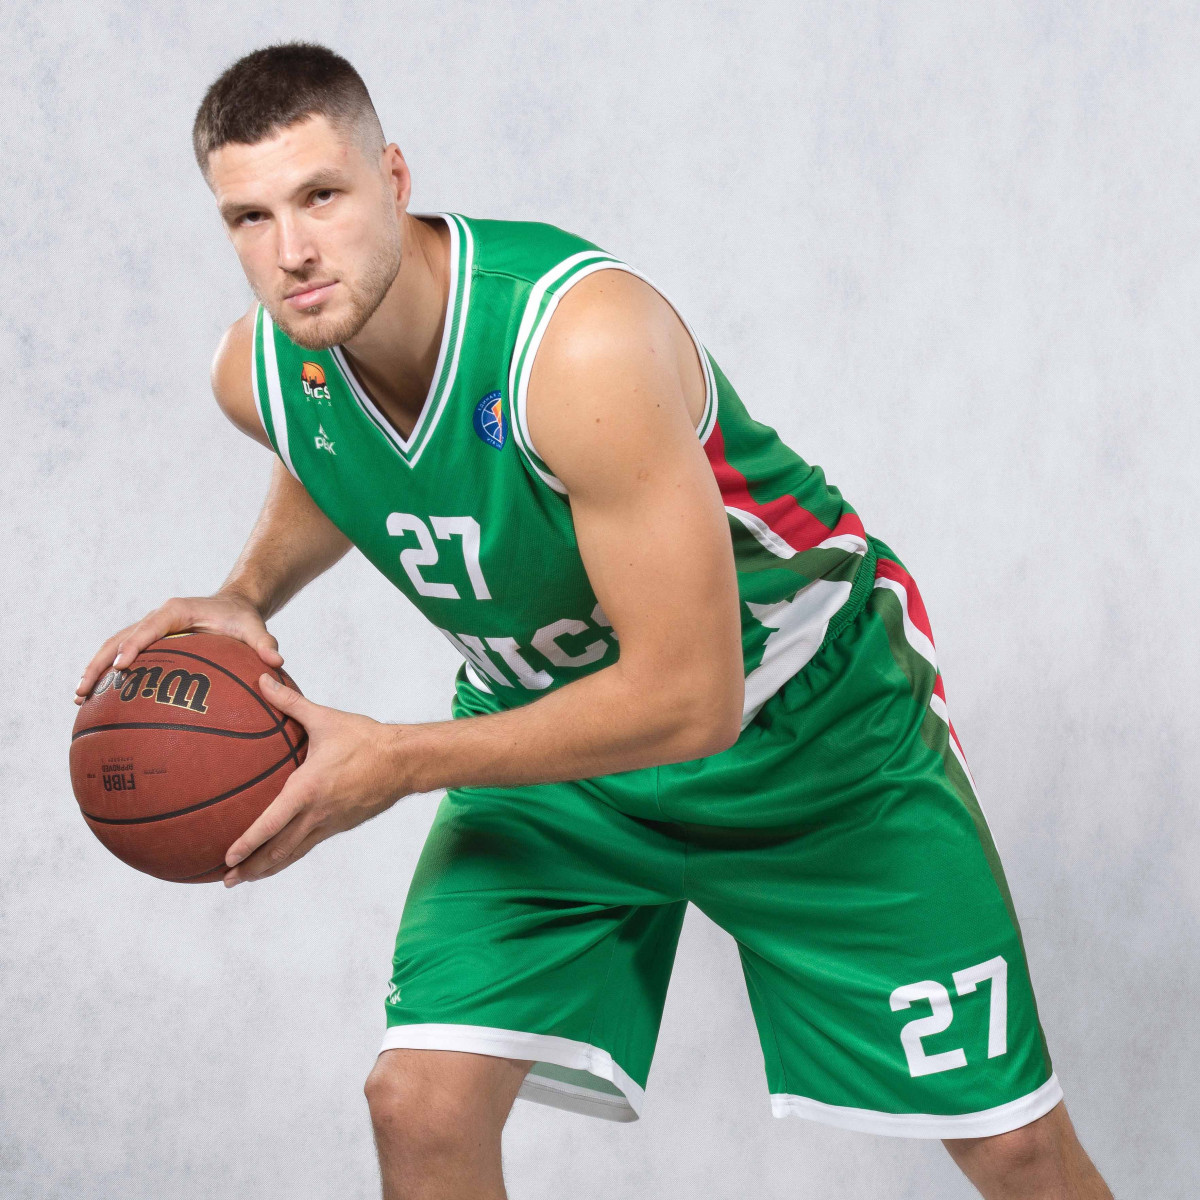 Photo of Andrey Koscheev, 2017-2018 season